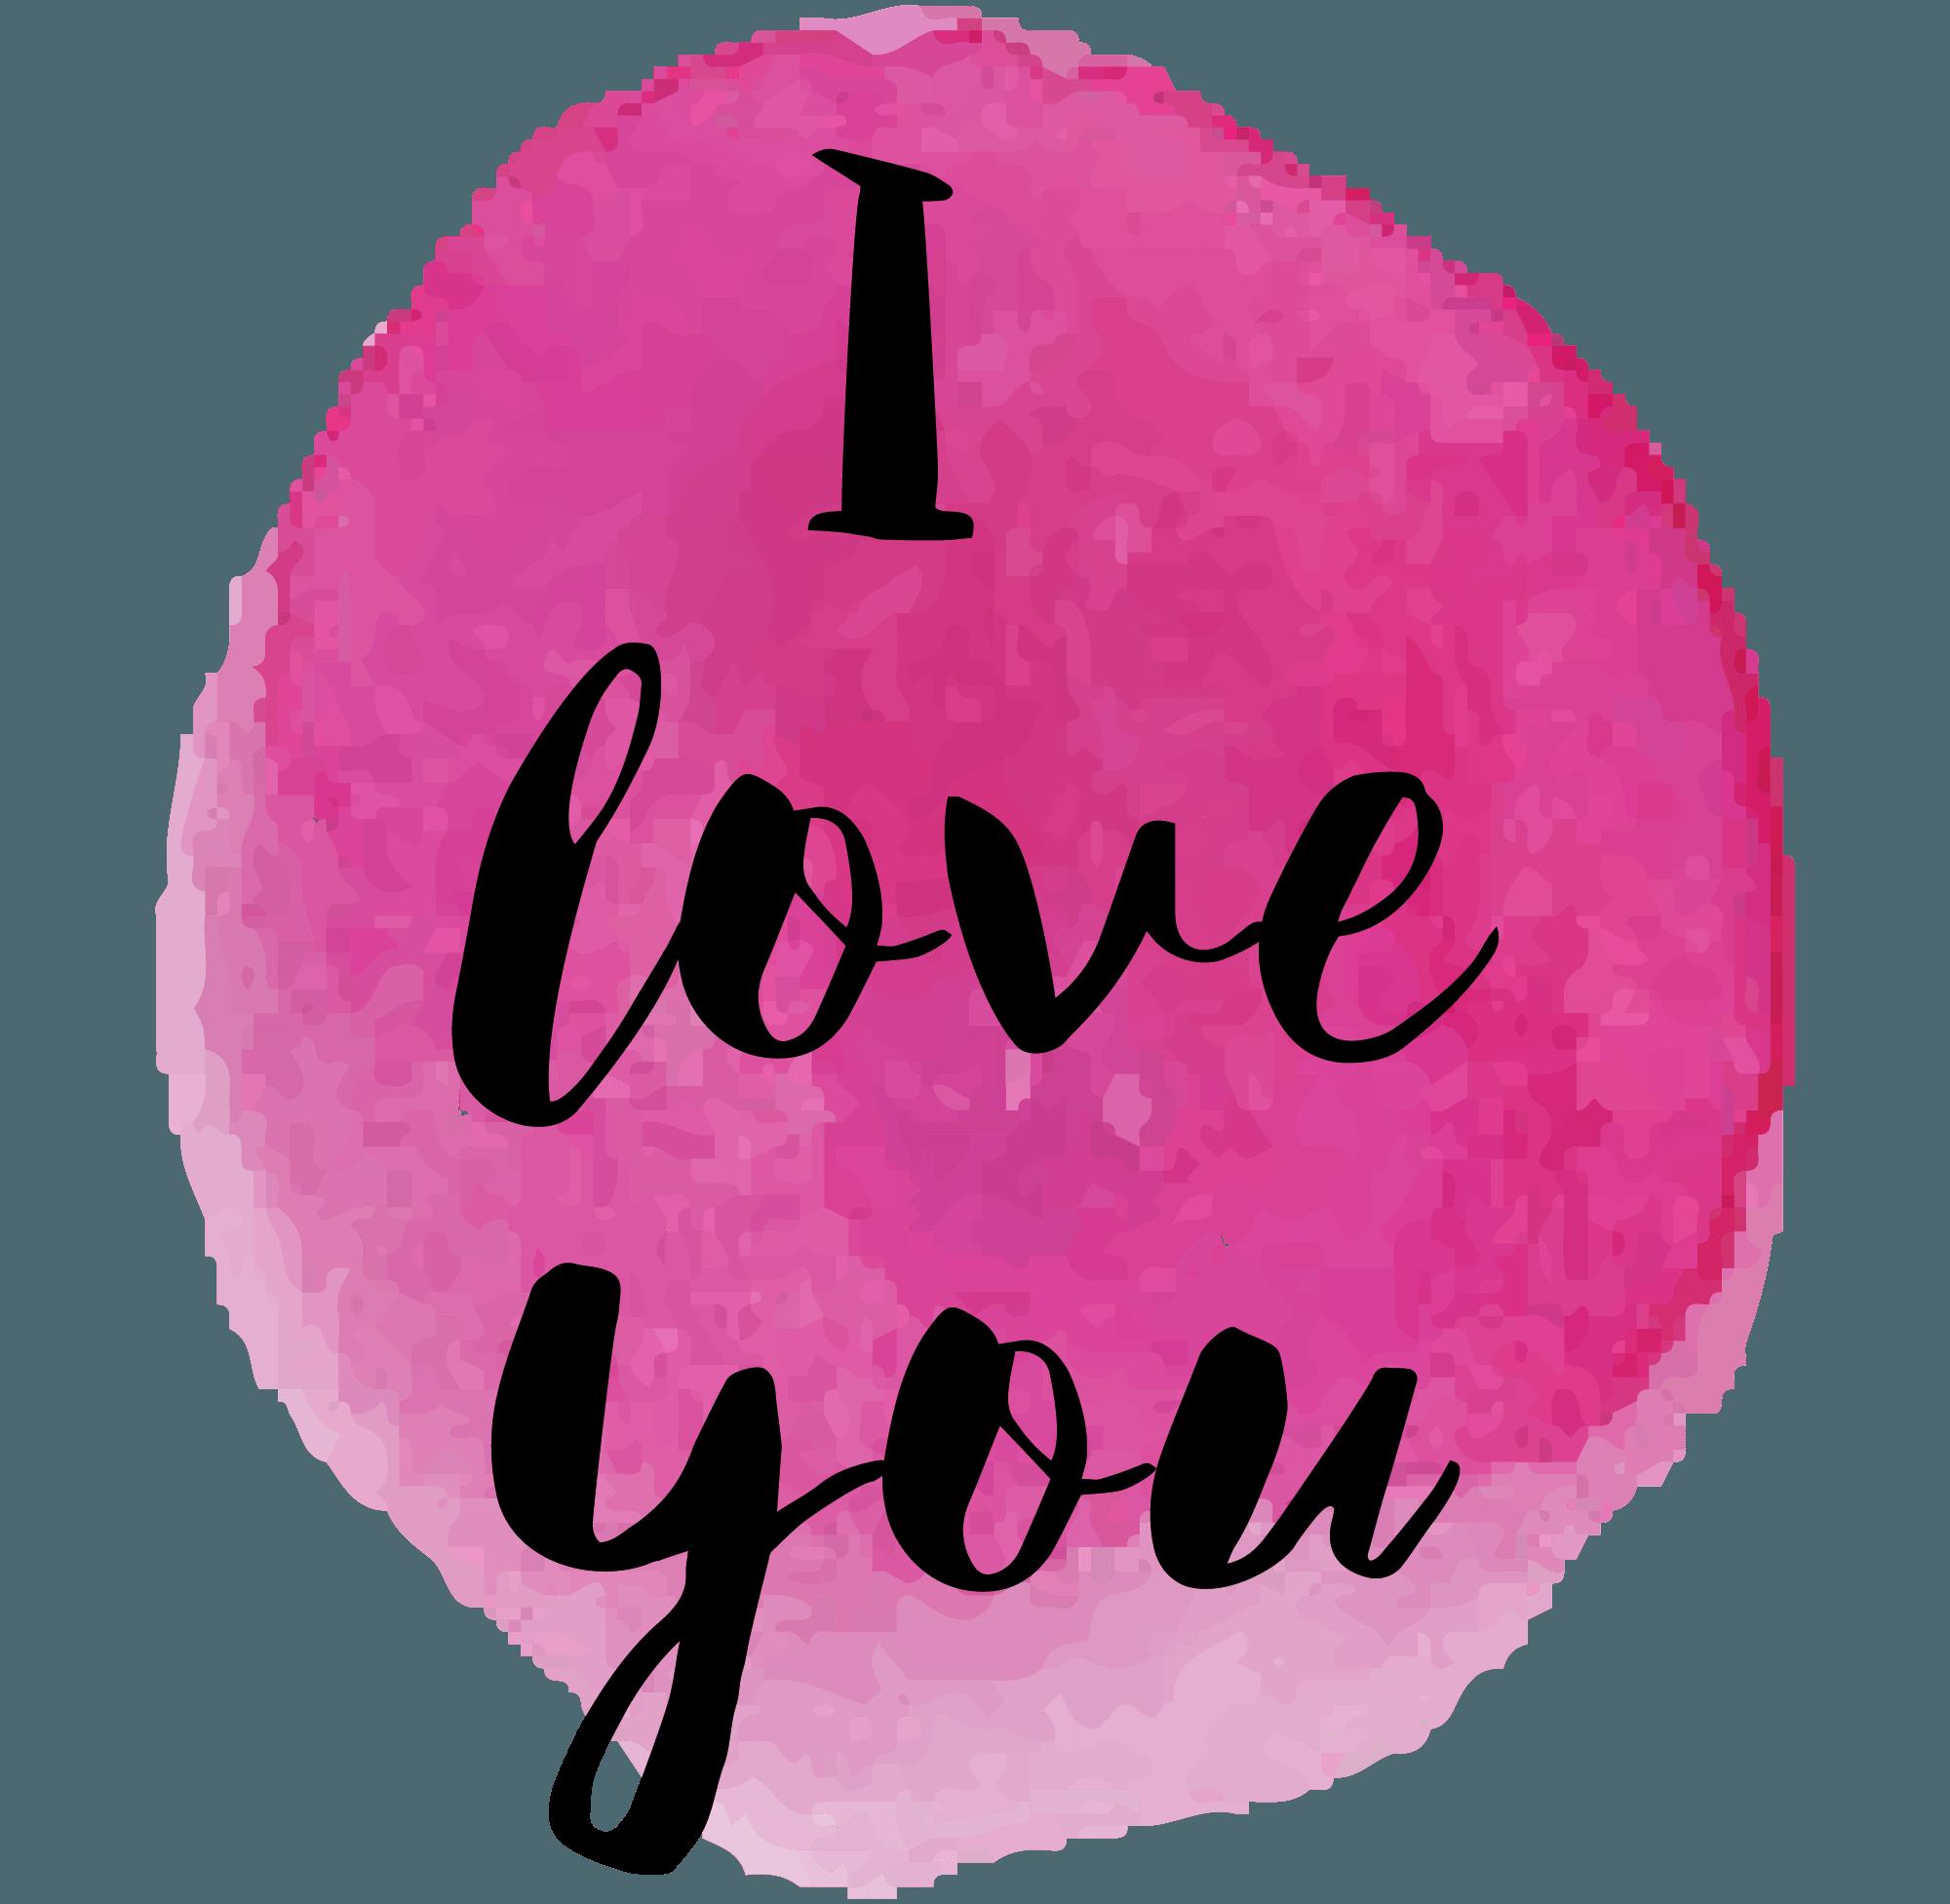 GirlTalk Affirmations messages sticker-2